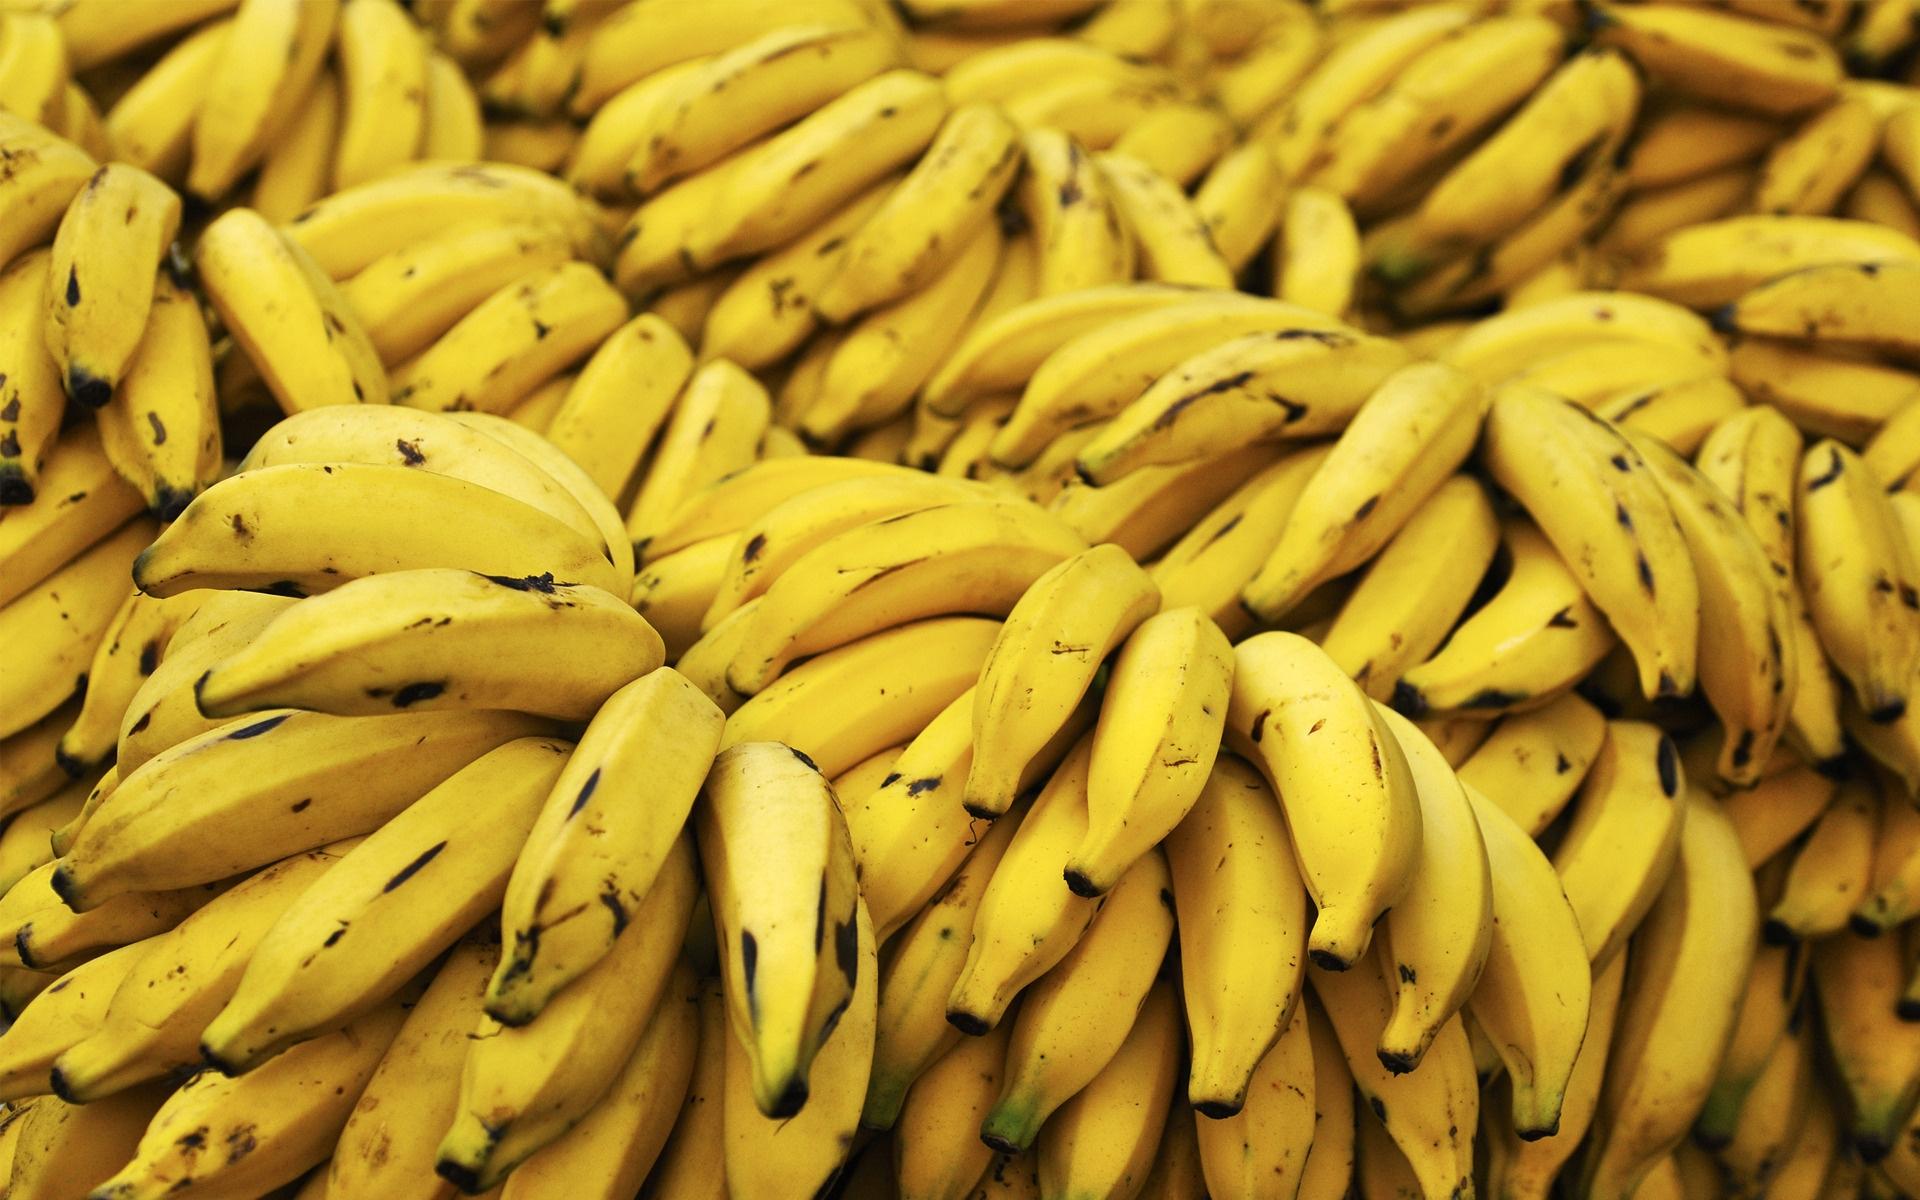 banana hd wallpaper